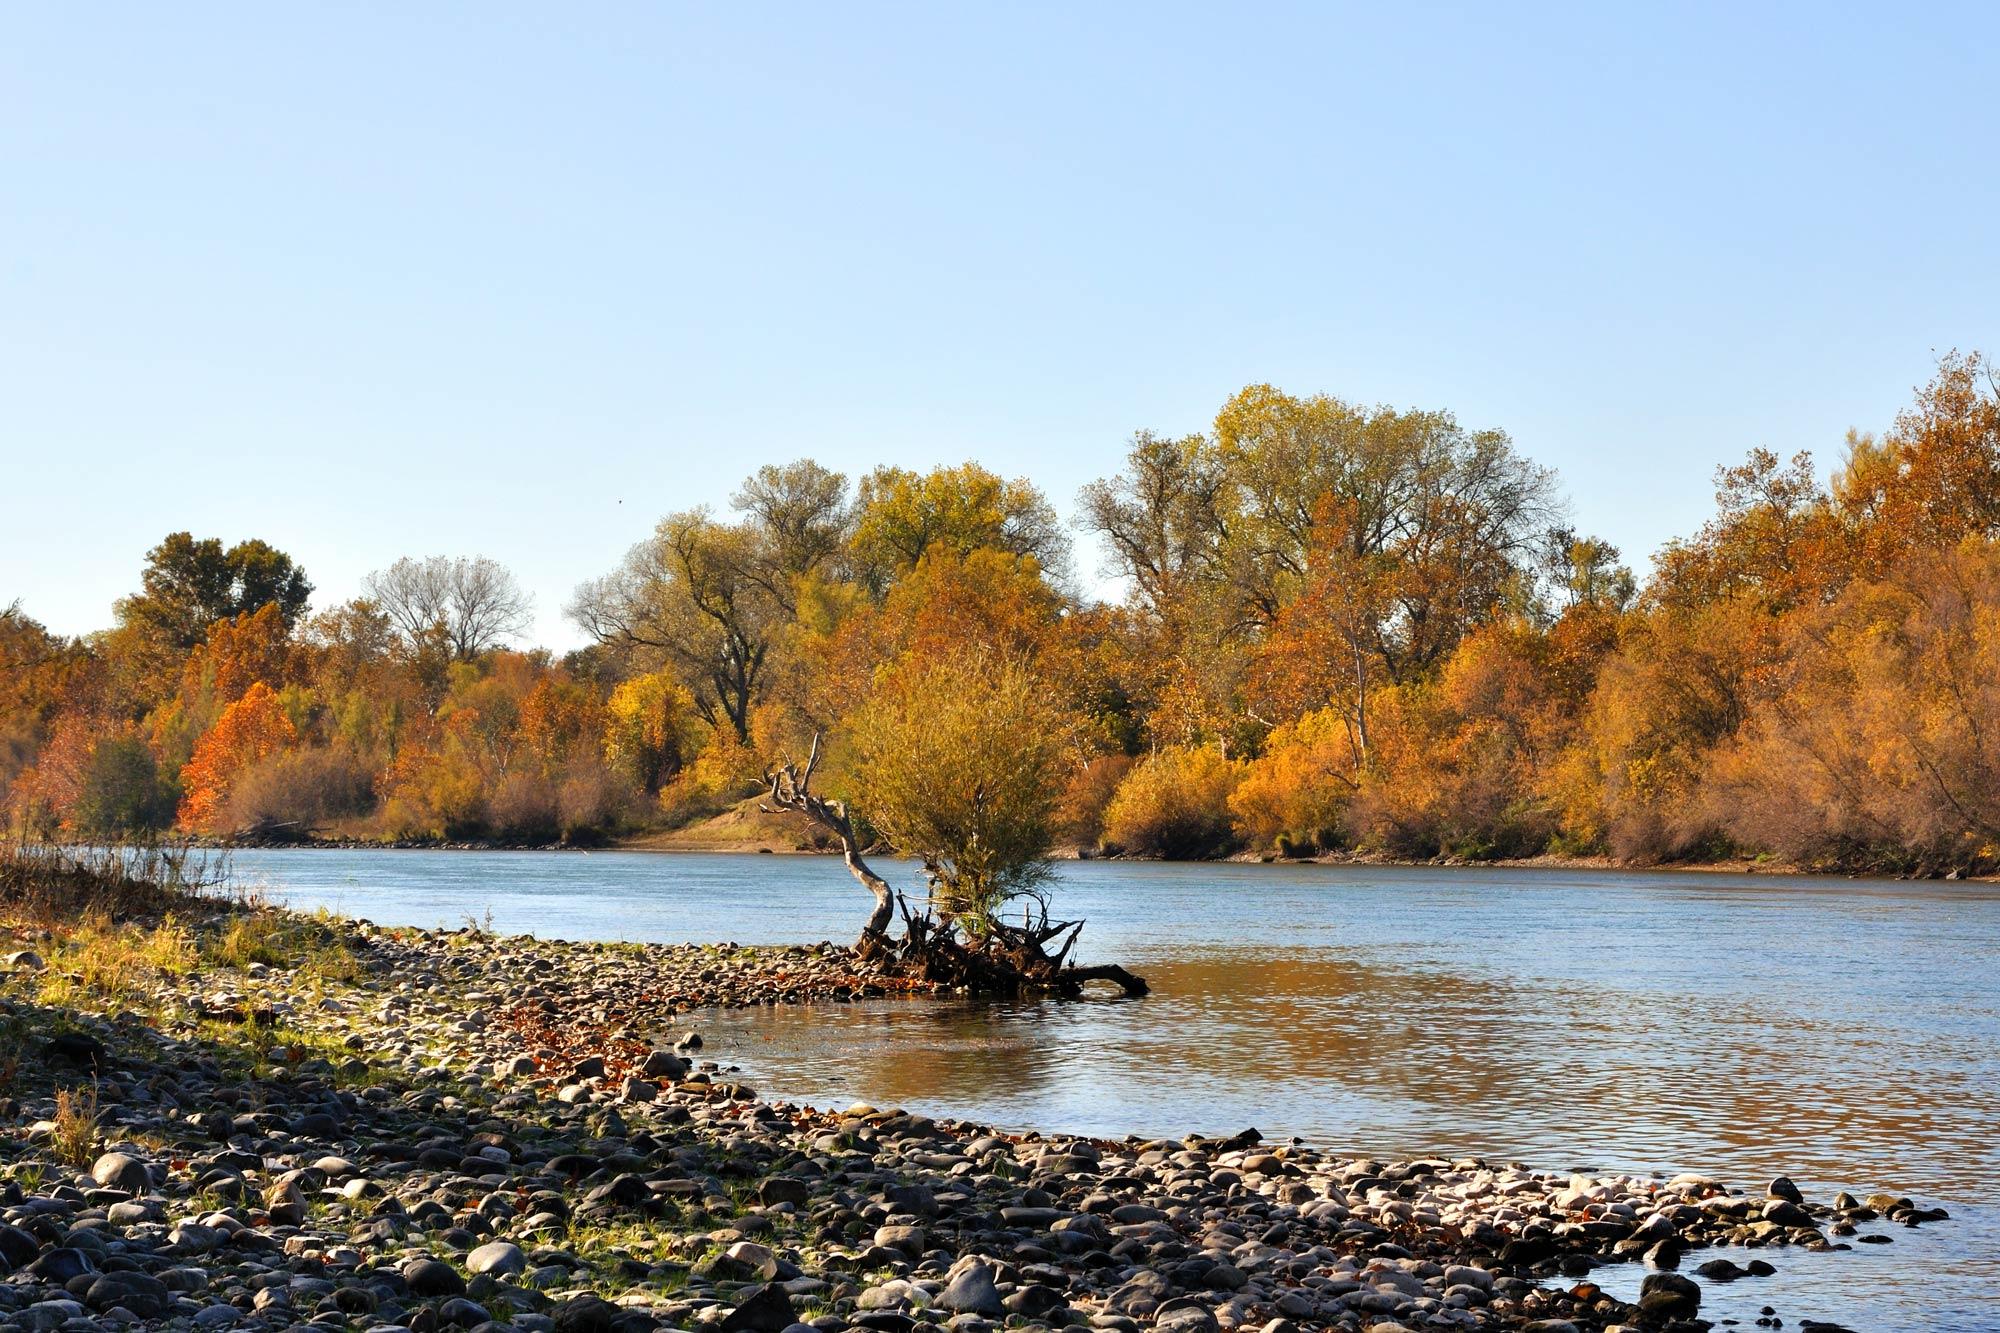 The bank of the Sacramento River in autumn